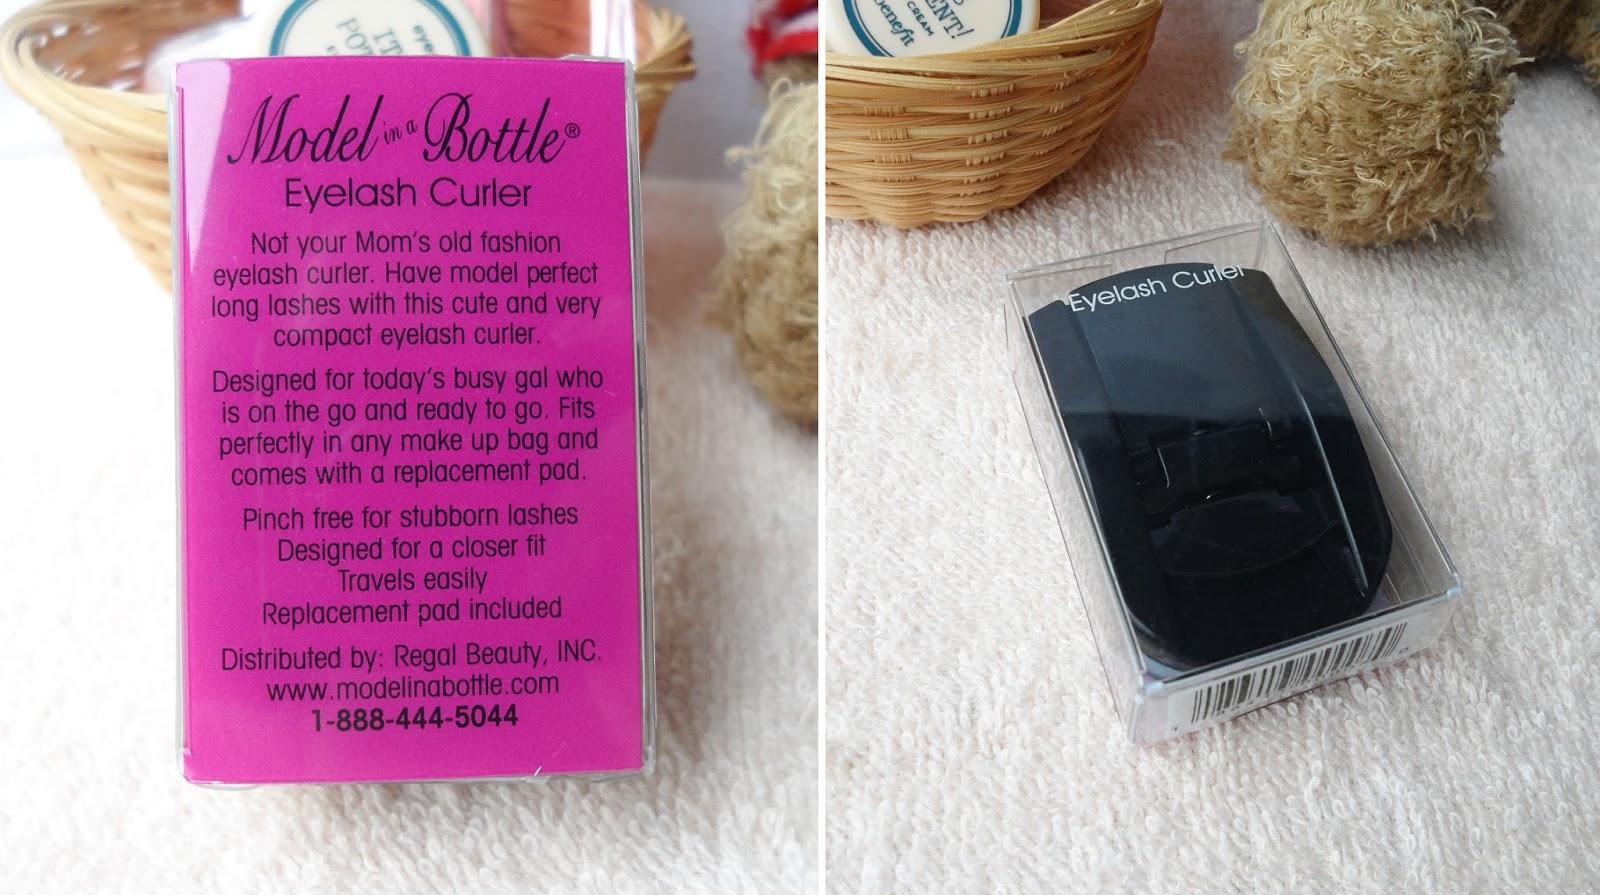 model in a bottle cosmetics spray review pictures liz breygel